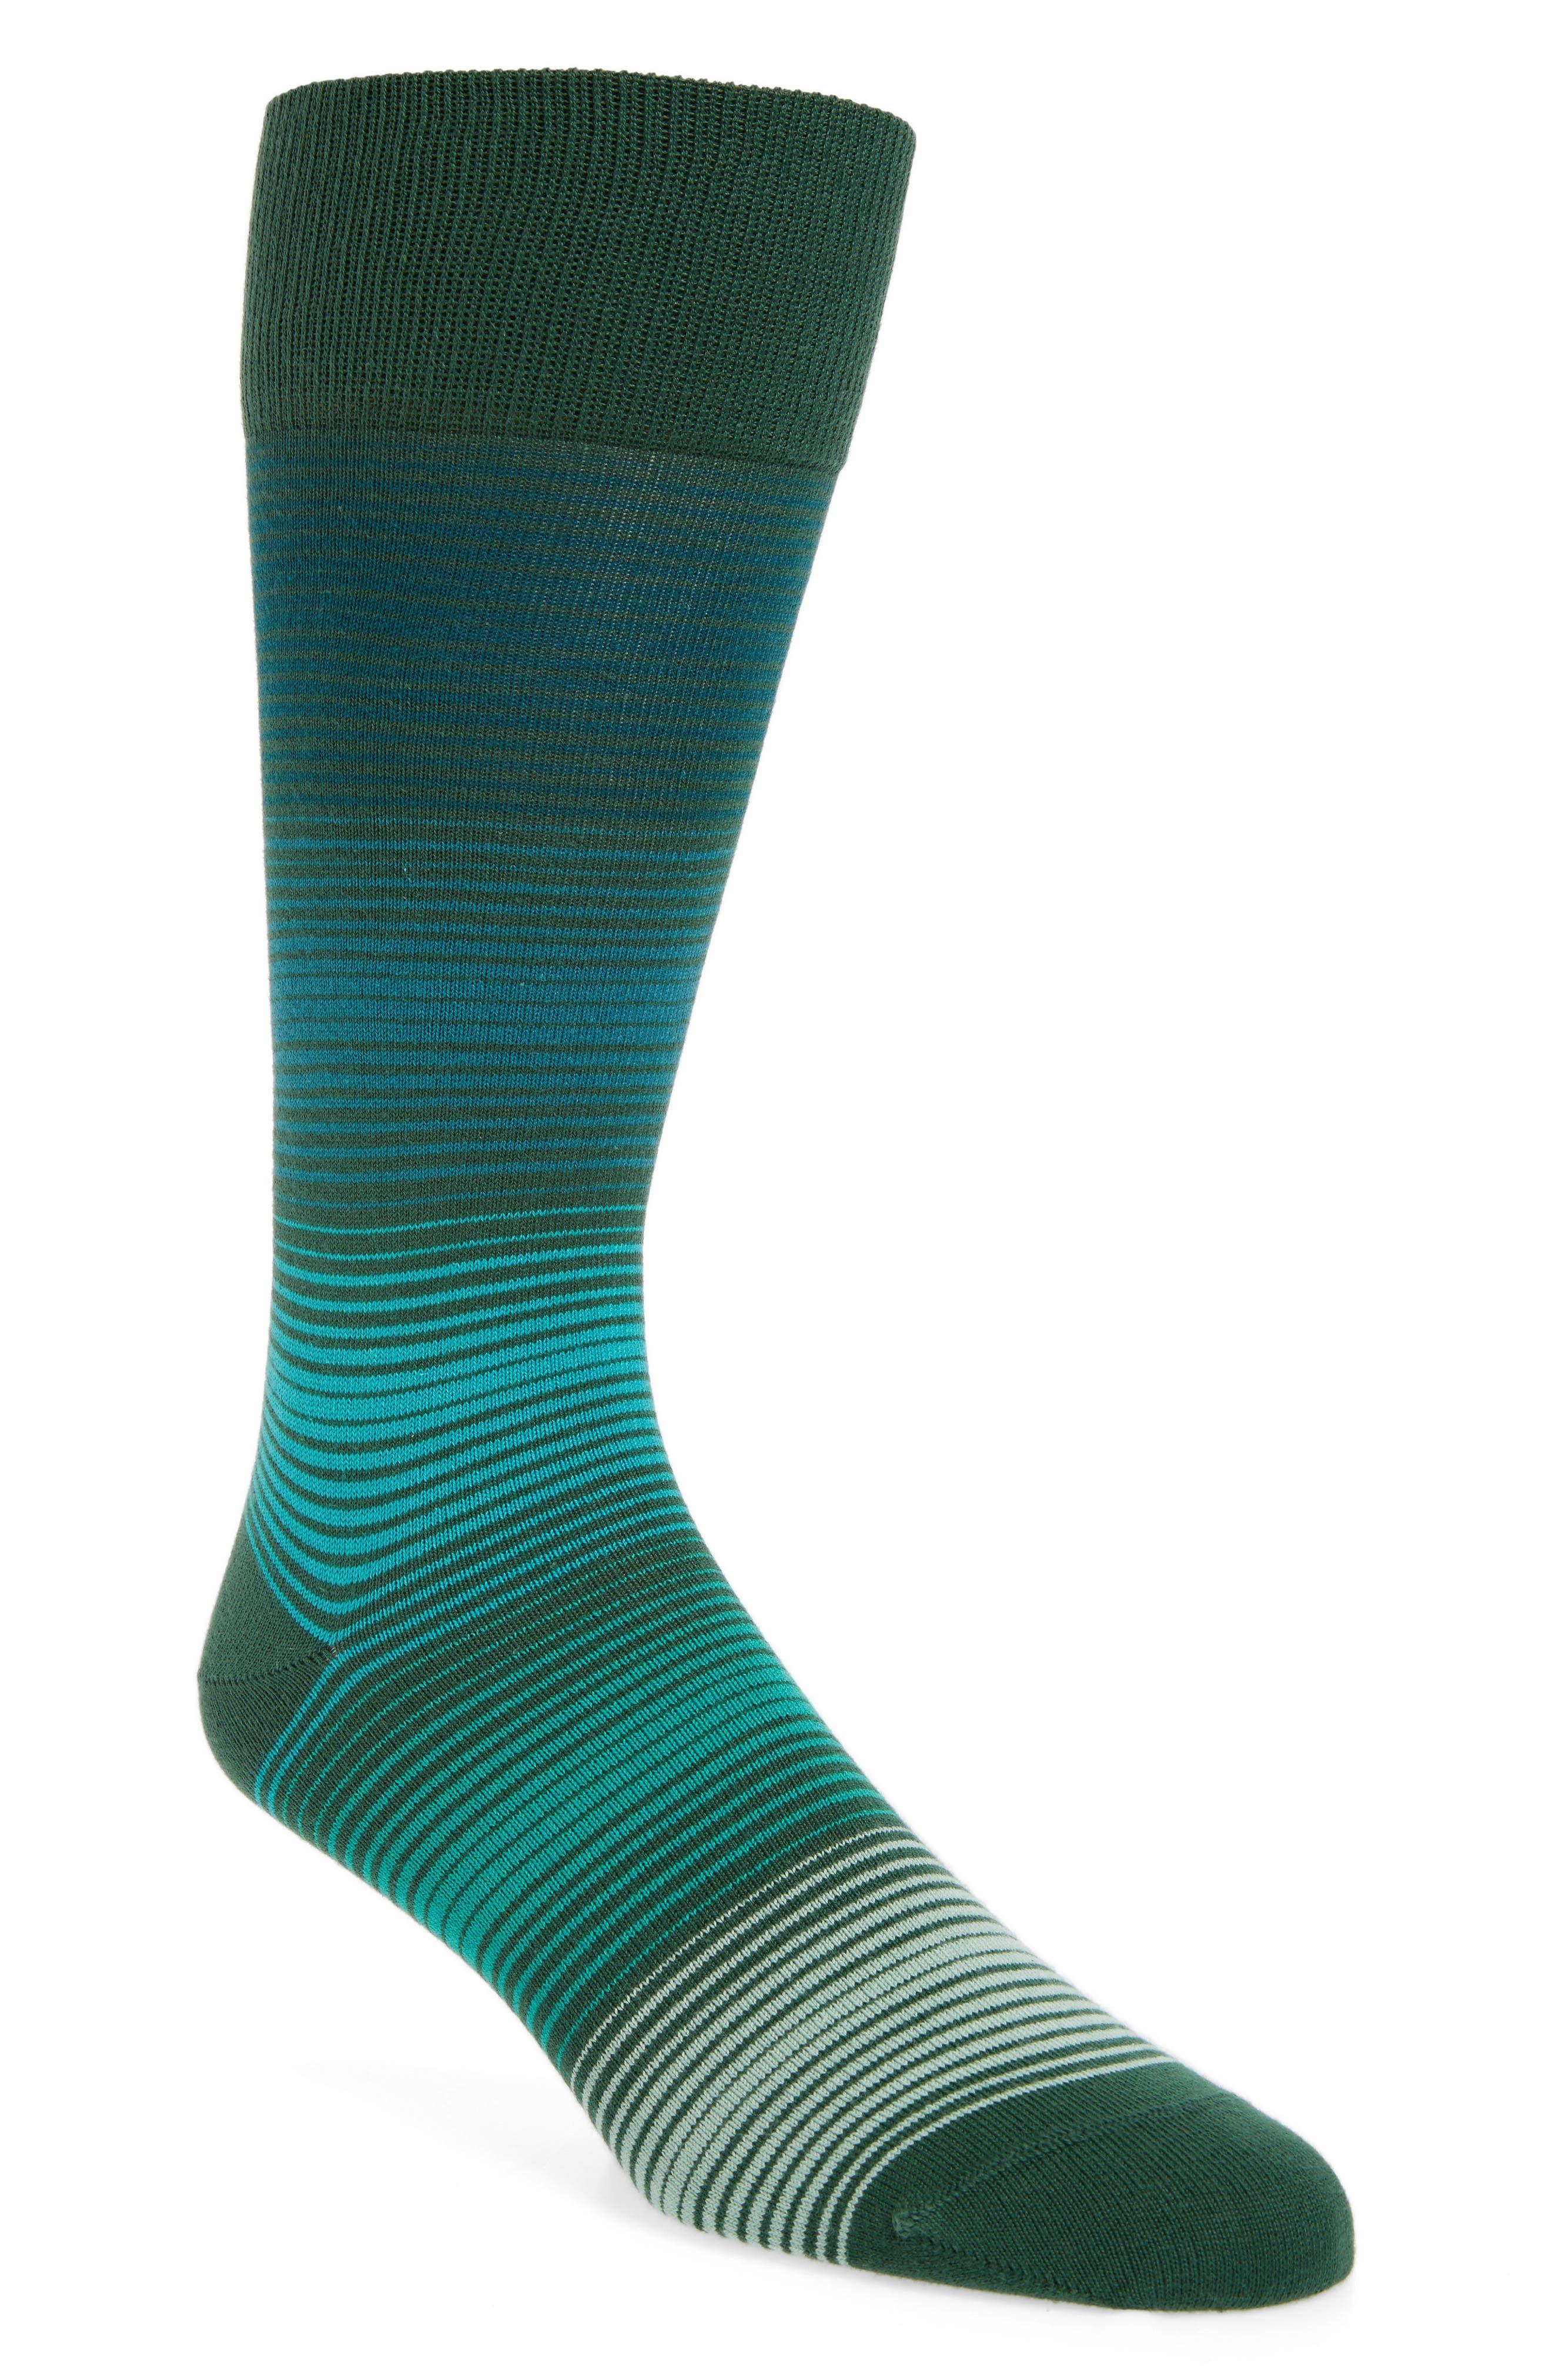 Alternate Image 1 Selected - Paul Smith Fine Grade Socks